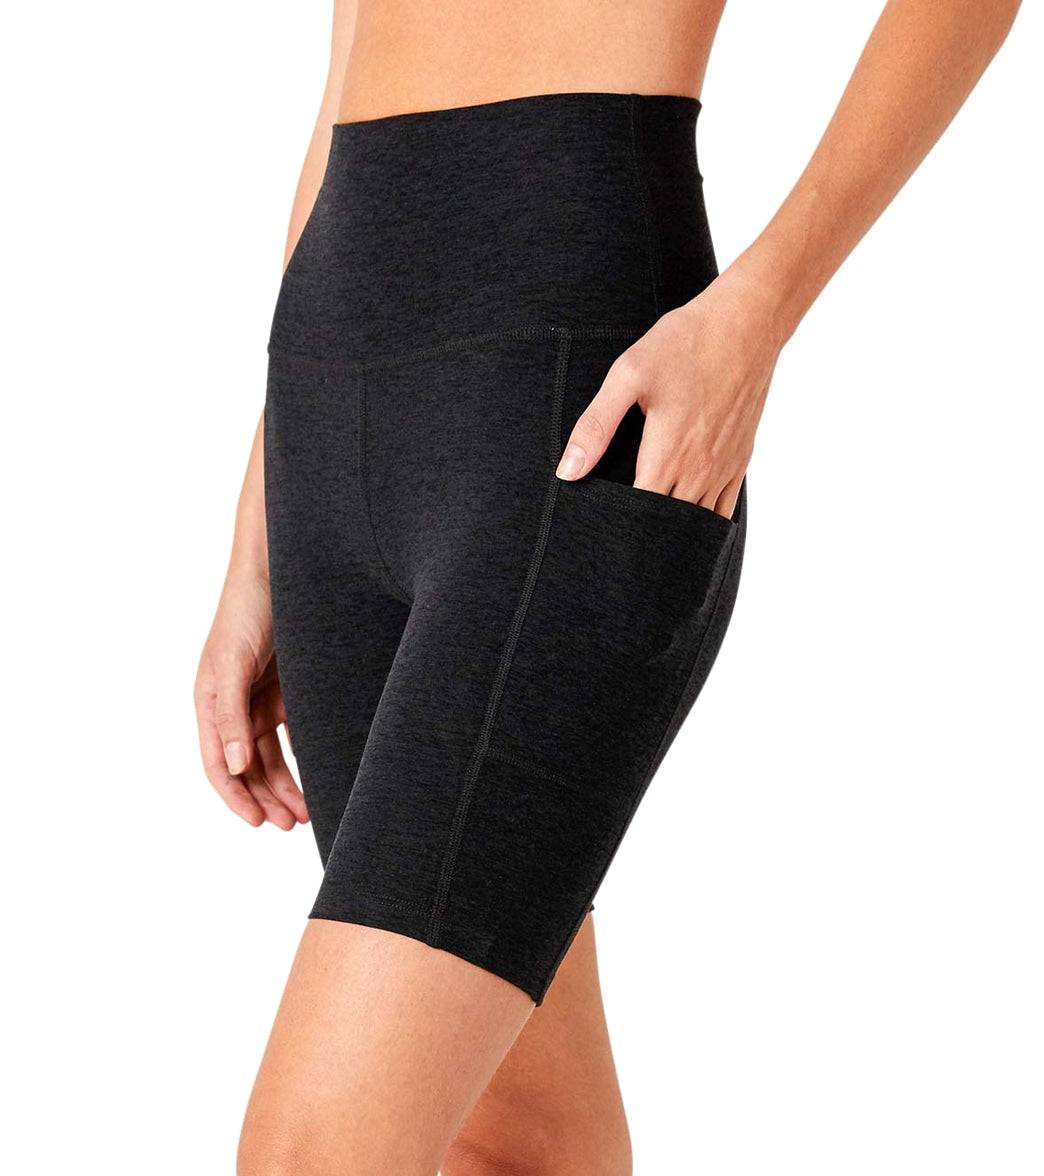 Beyond Yoga Women's Spacedye Team Pockets High Waisted Biker Shorts - Darkest Night Large Spandex